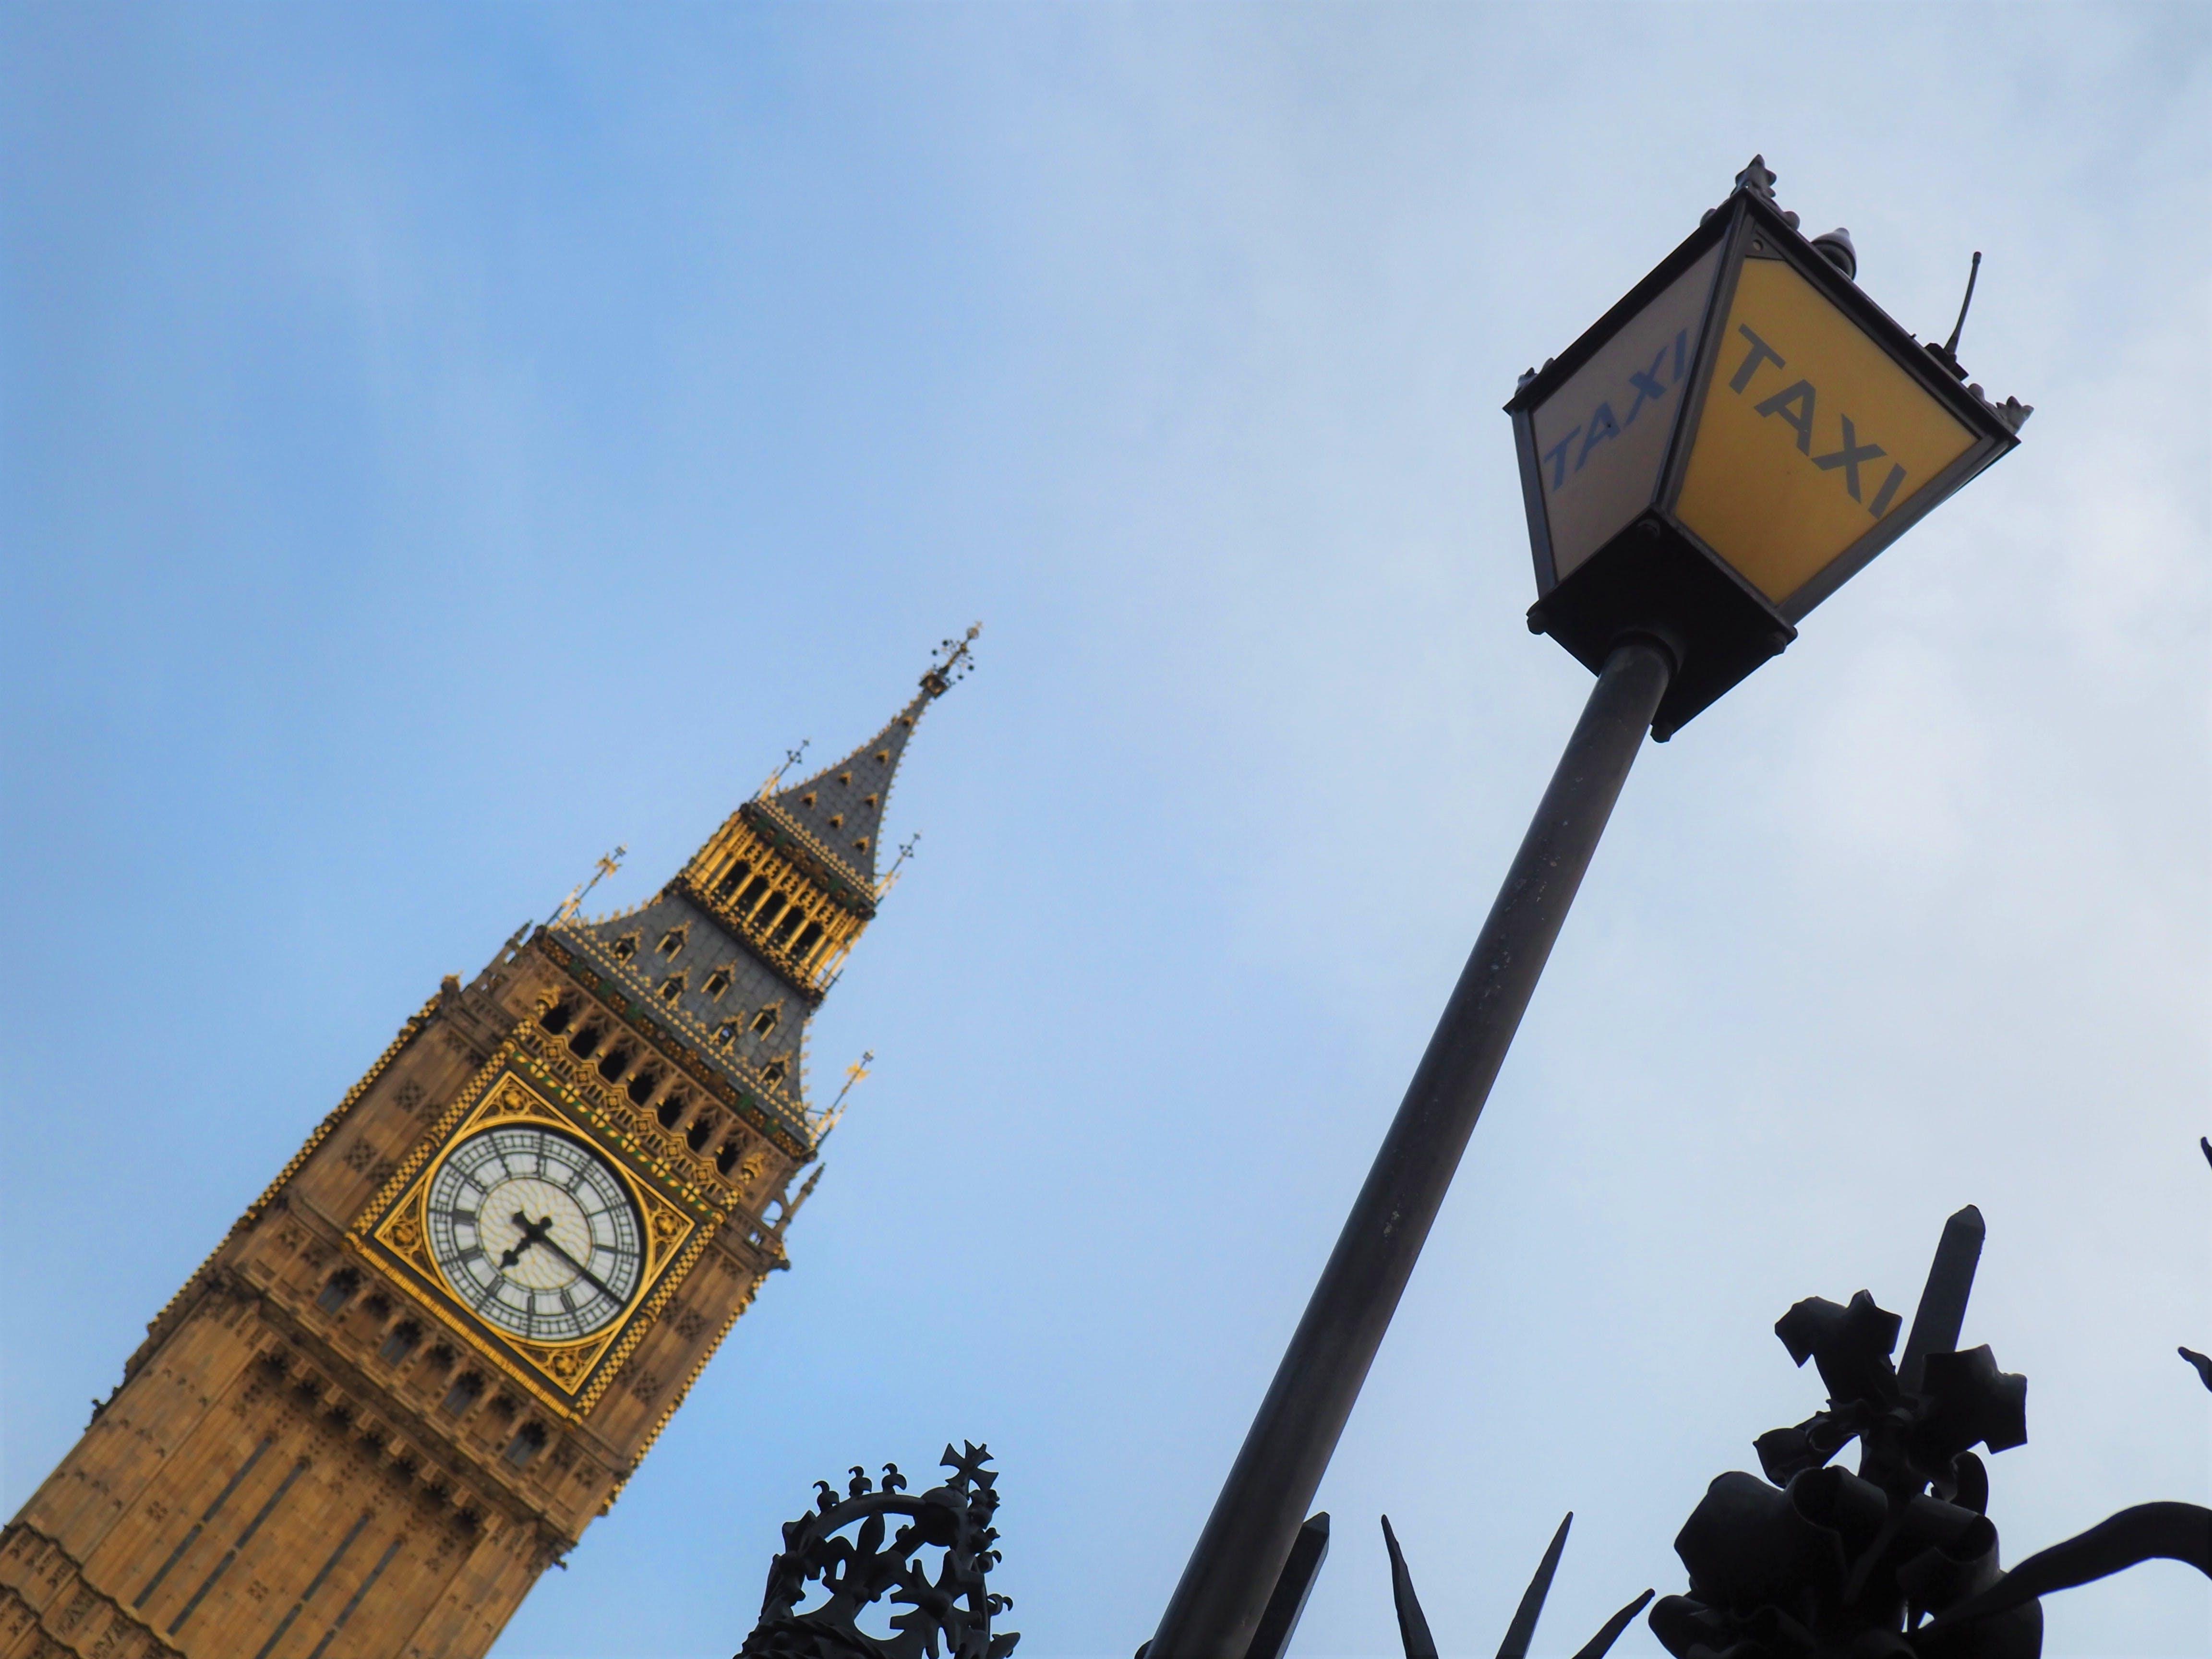 Free stock photo of big ben, clock tower, england, great britain